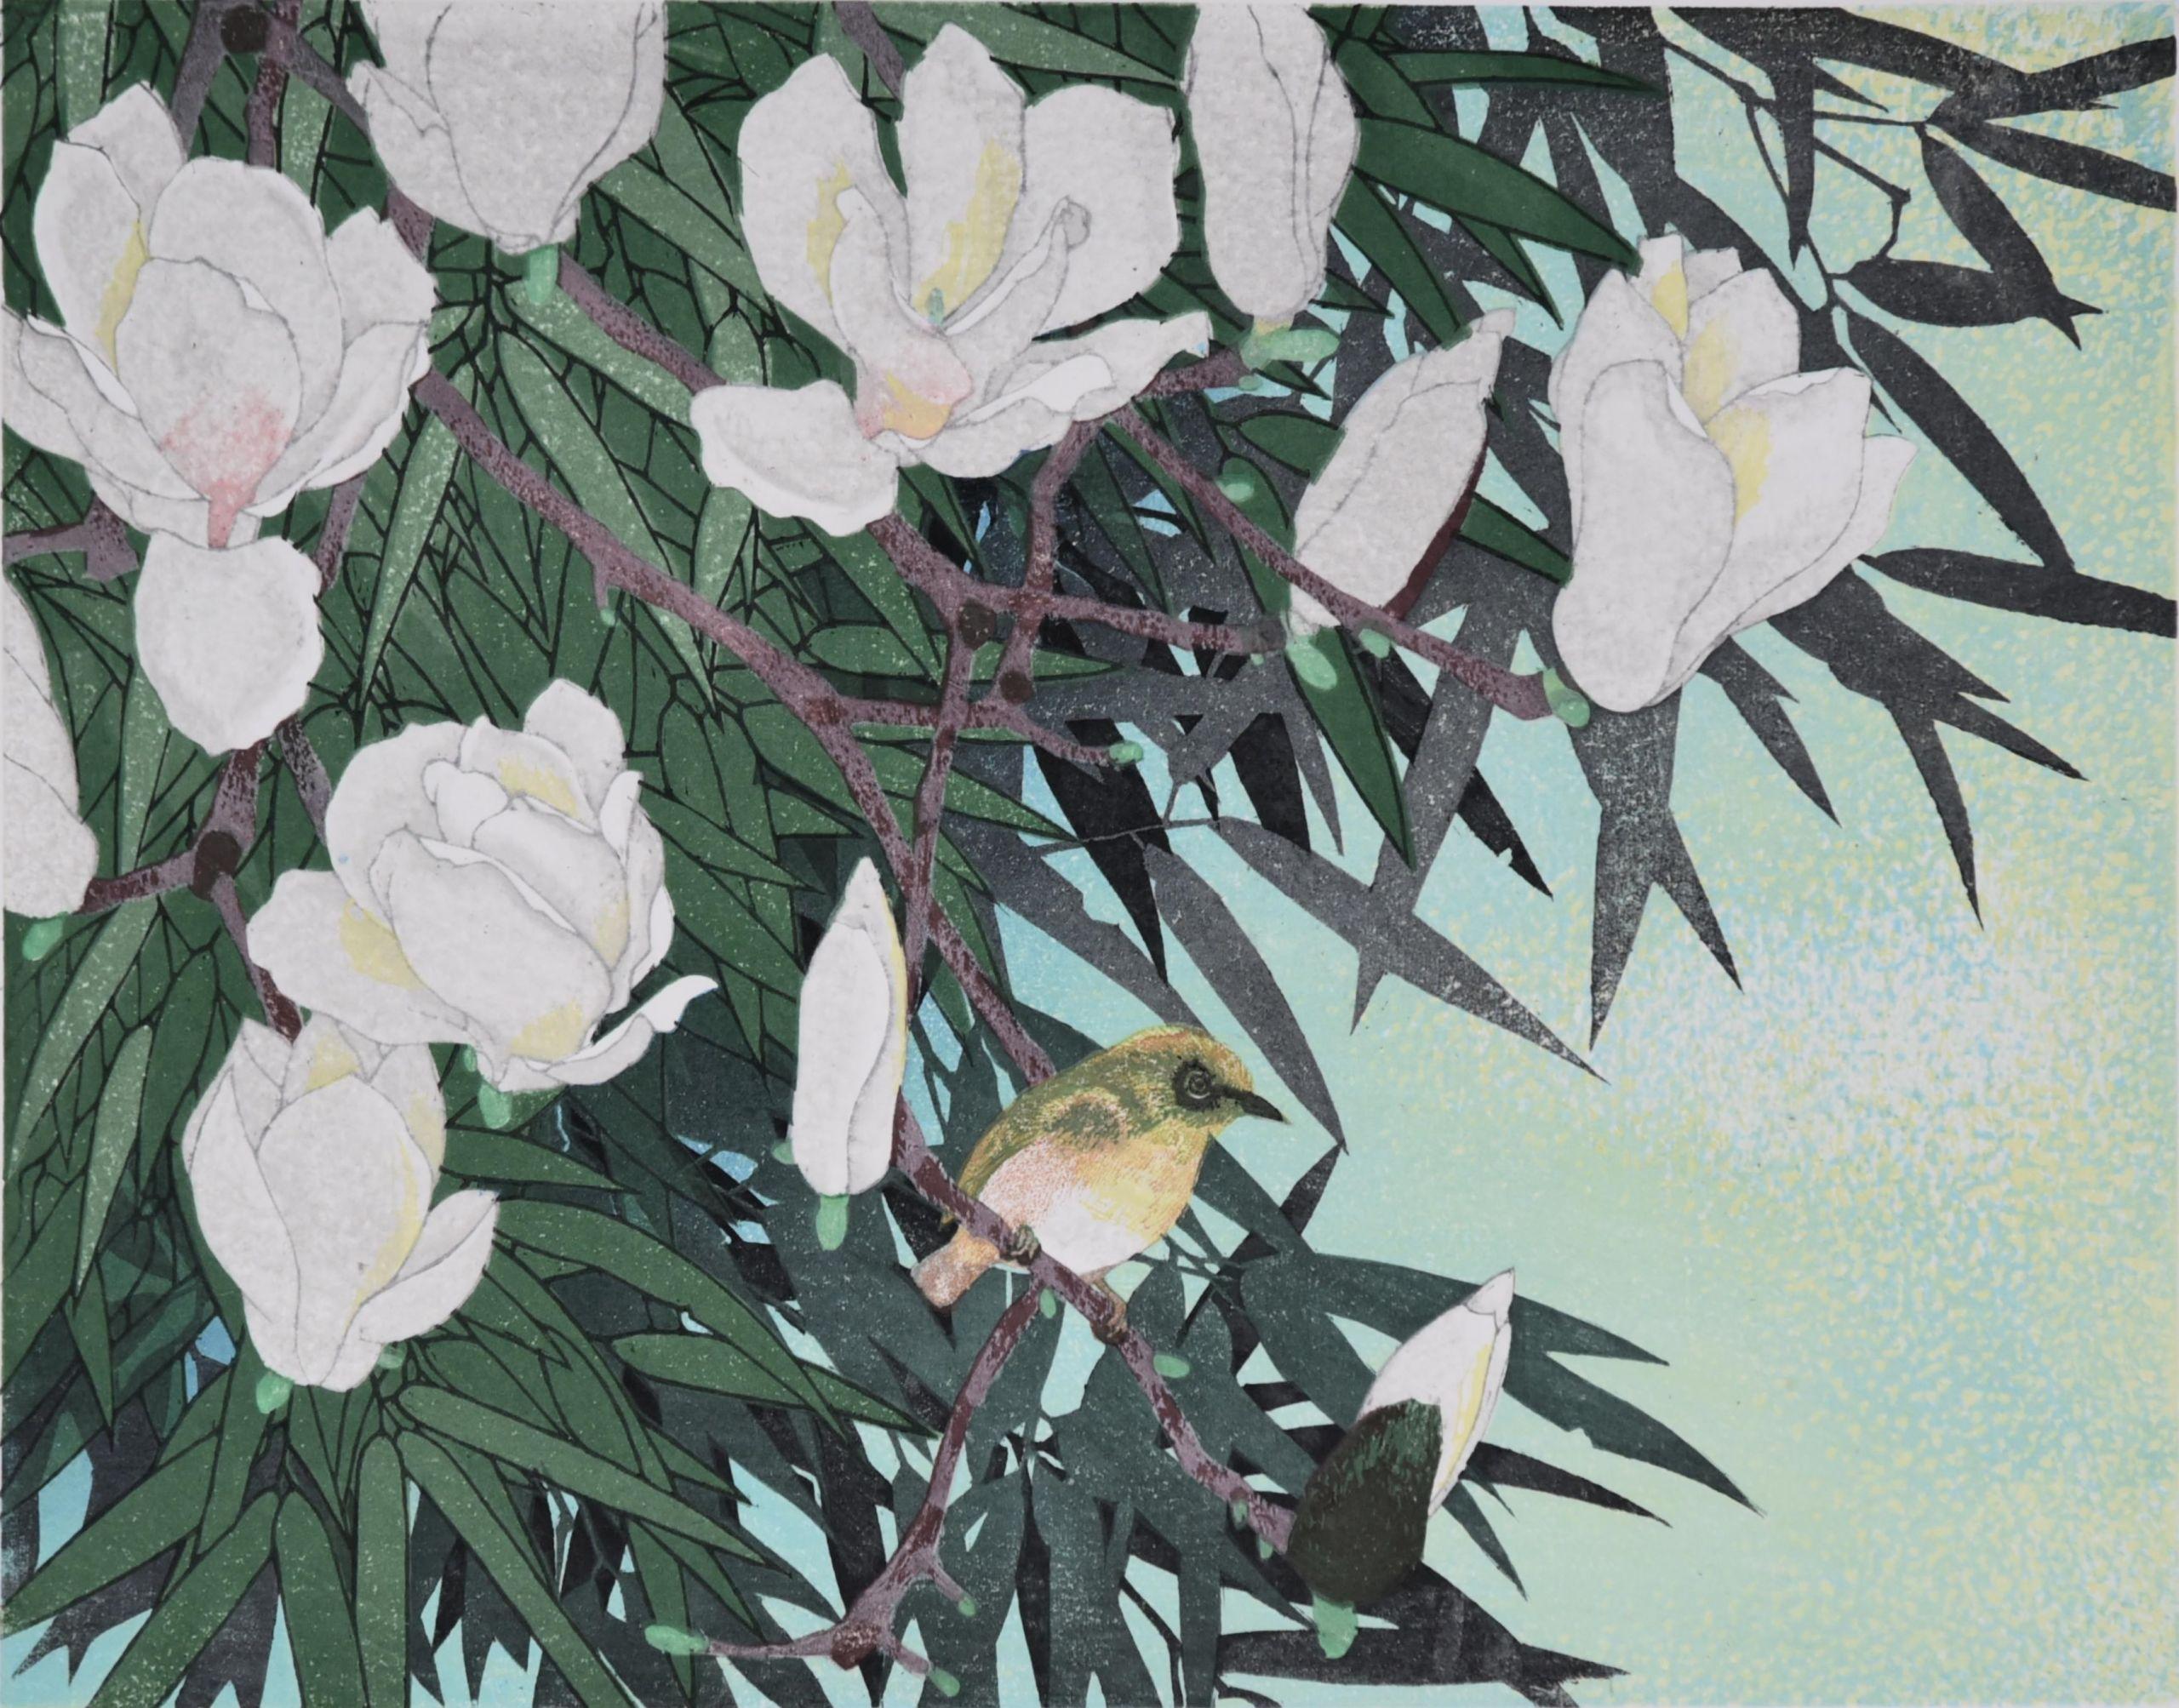 YAMAMOTO Hiromu Λευκή Μανώλια Ξυλογραφία 32x41 εκ.